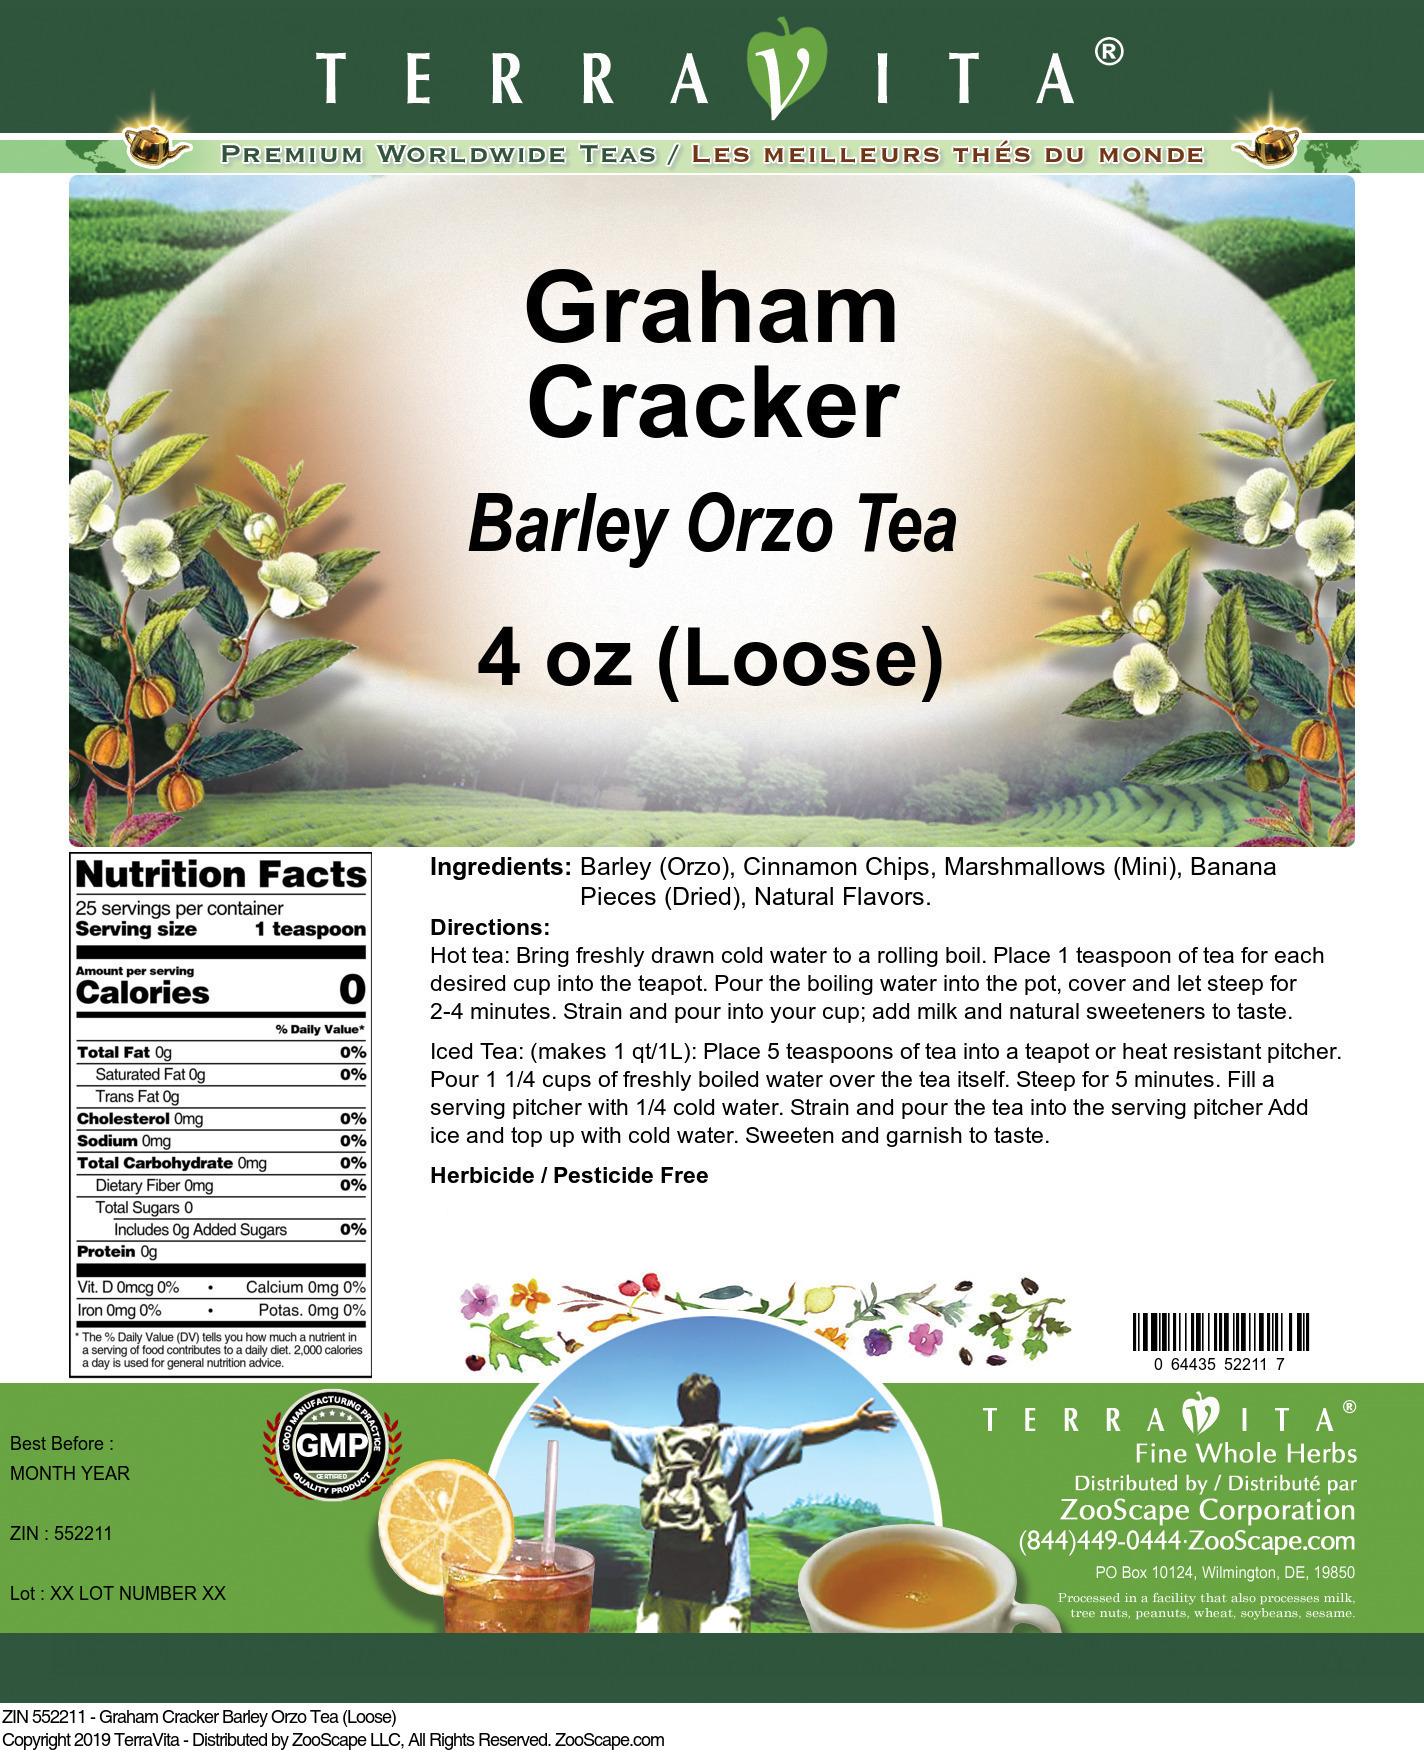 Graham Cracker Barley Orzo